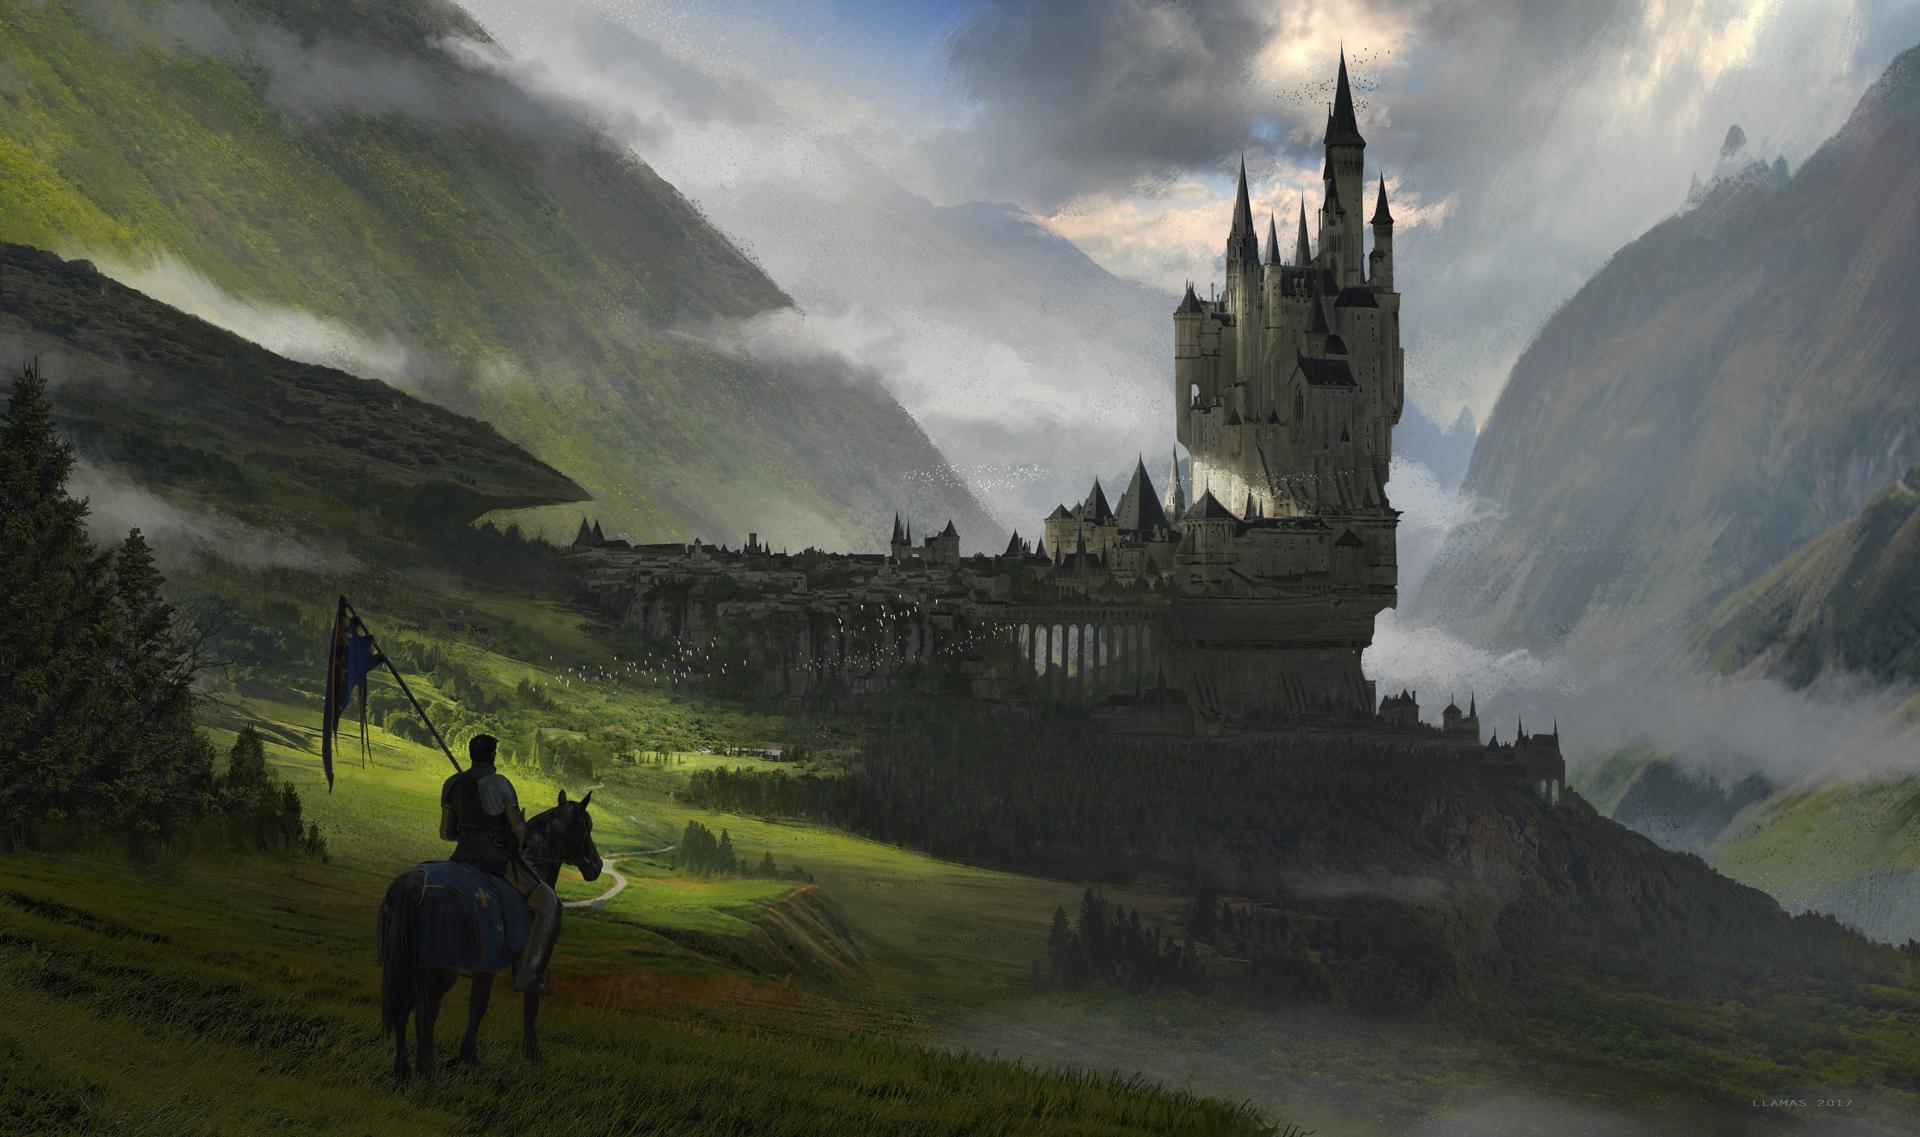 Castle City Fog Horse Landscape Warrior 1920x1137